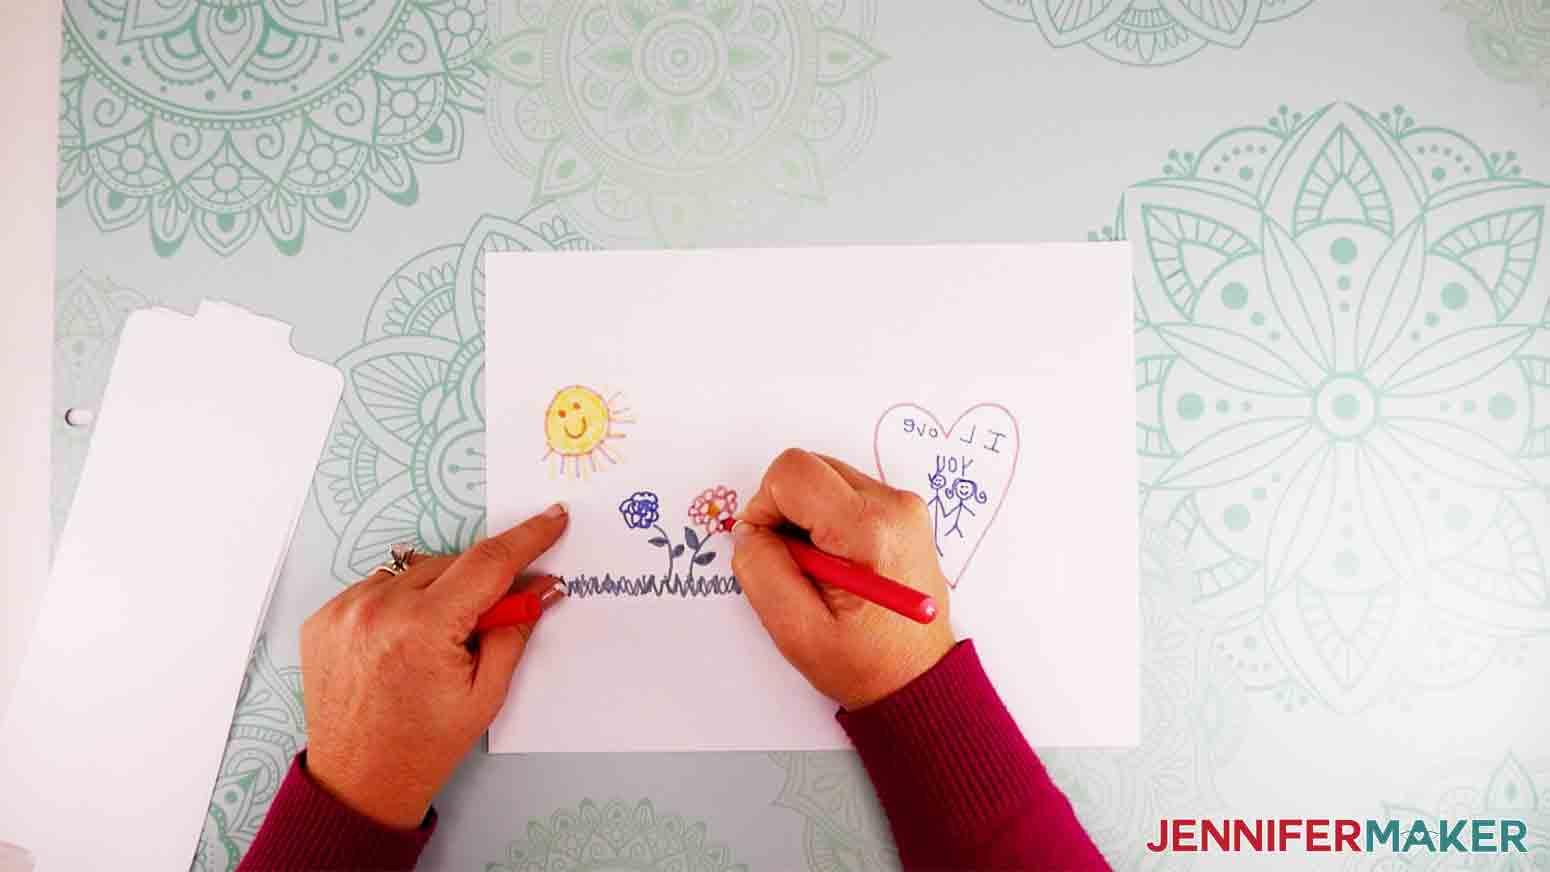 show second hand drawing on kid artwork mug